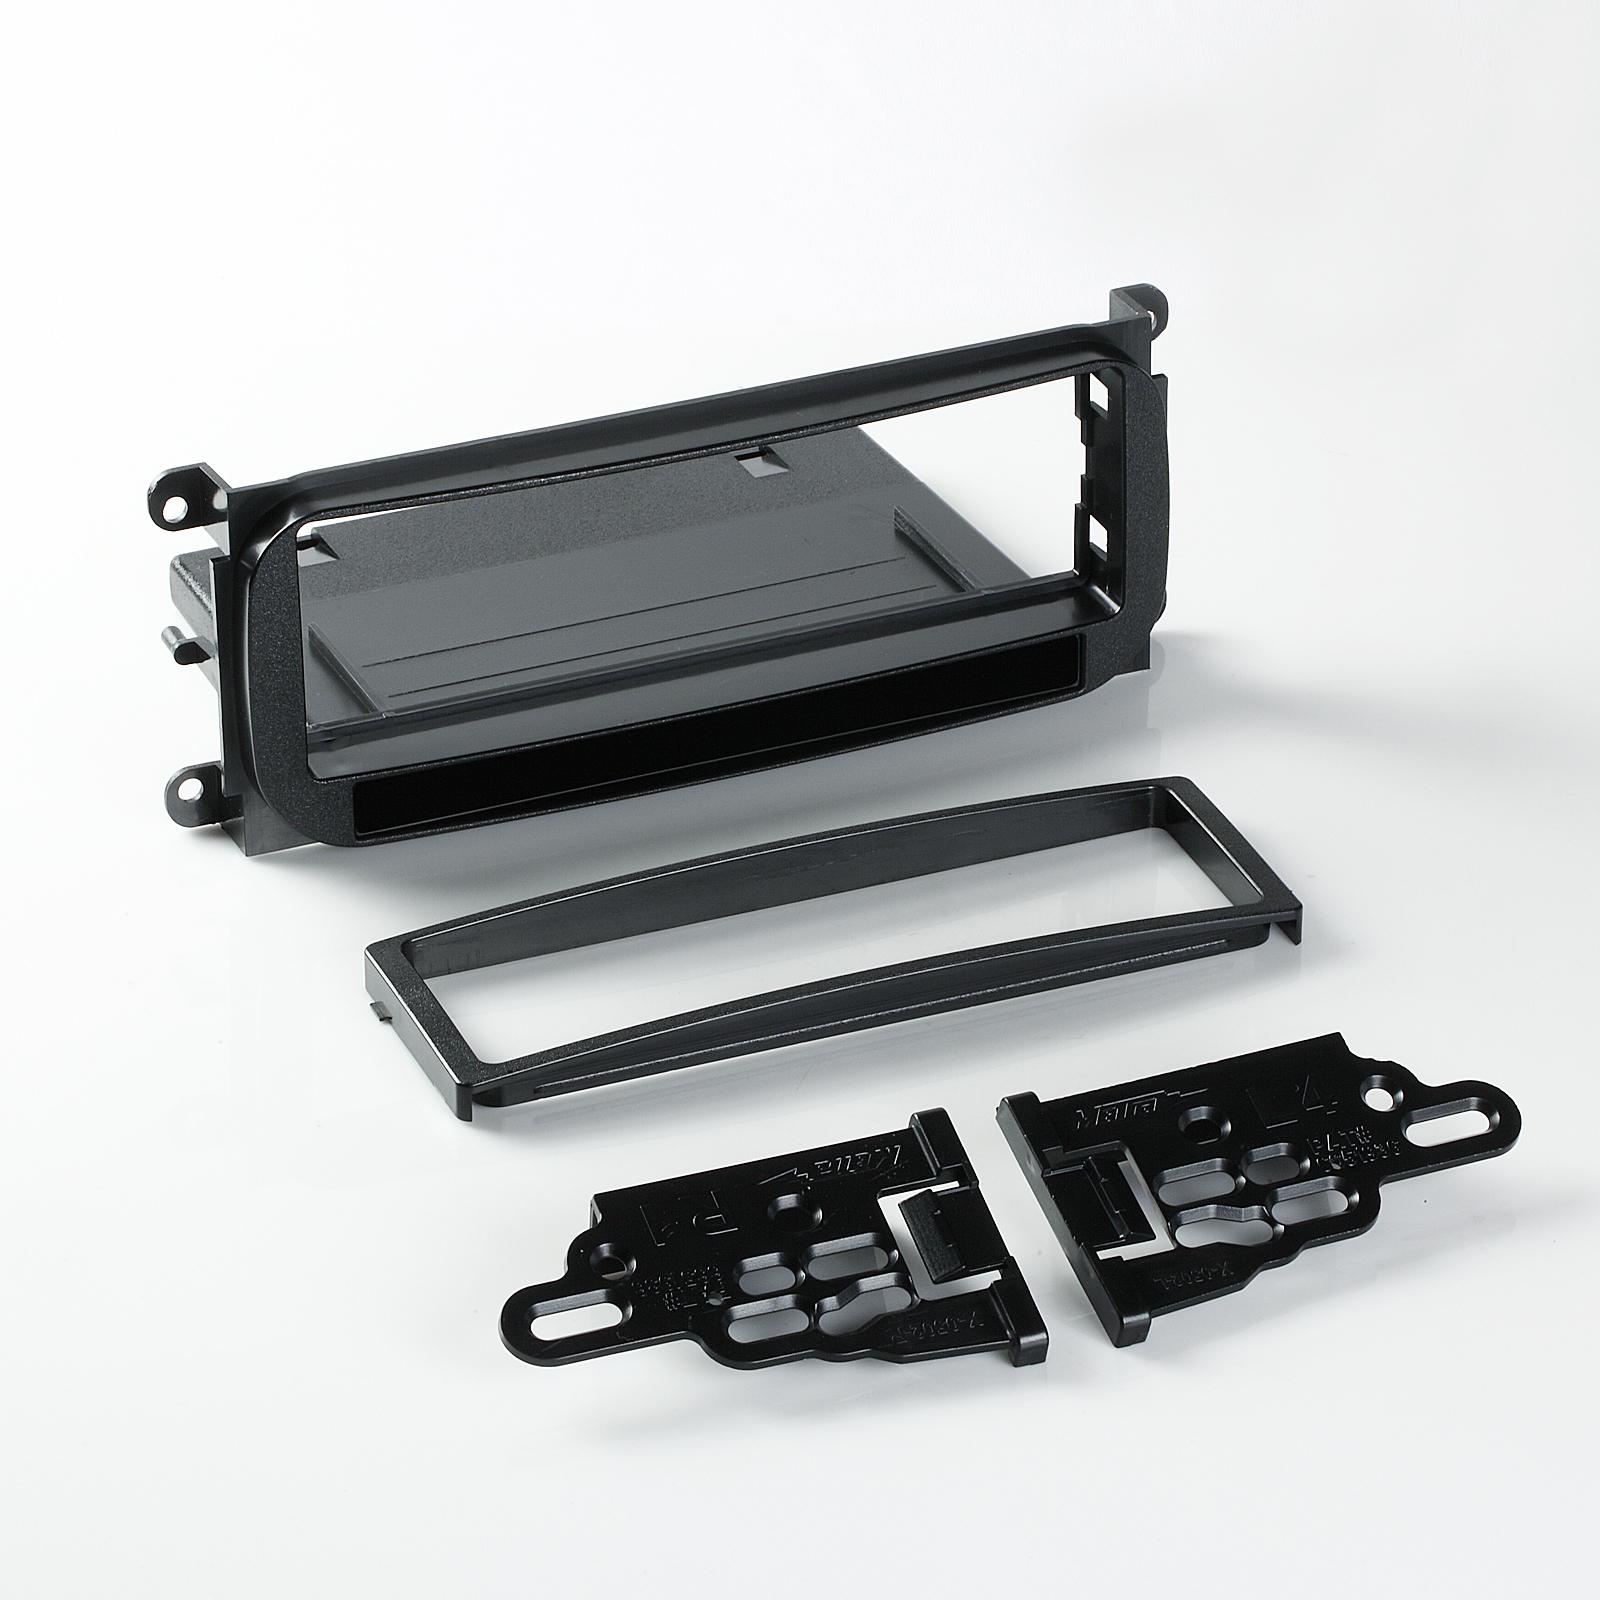 Radio Stereo Mounting Installation Dash Kit Combo Single DIN METRA 99-2005